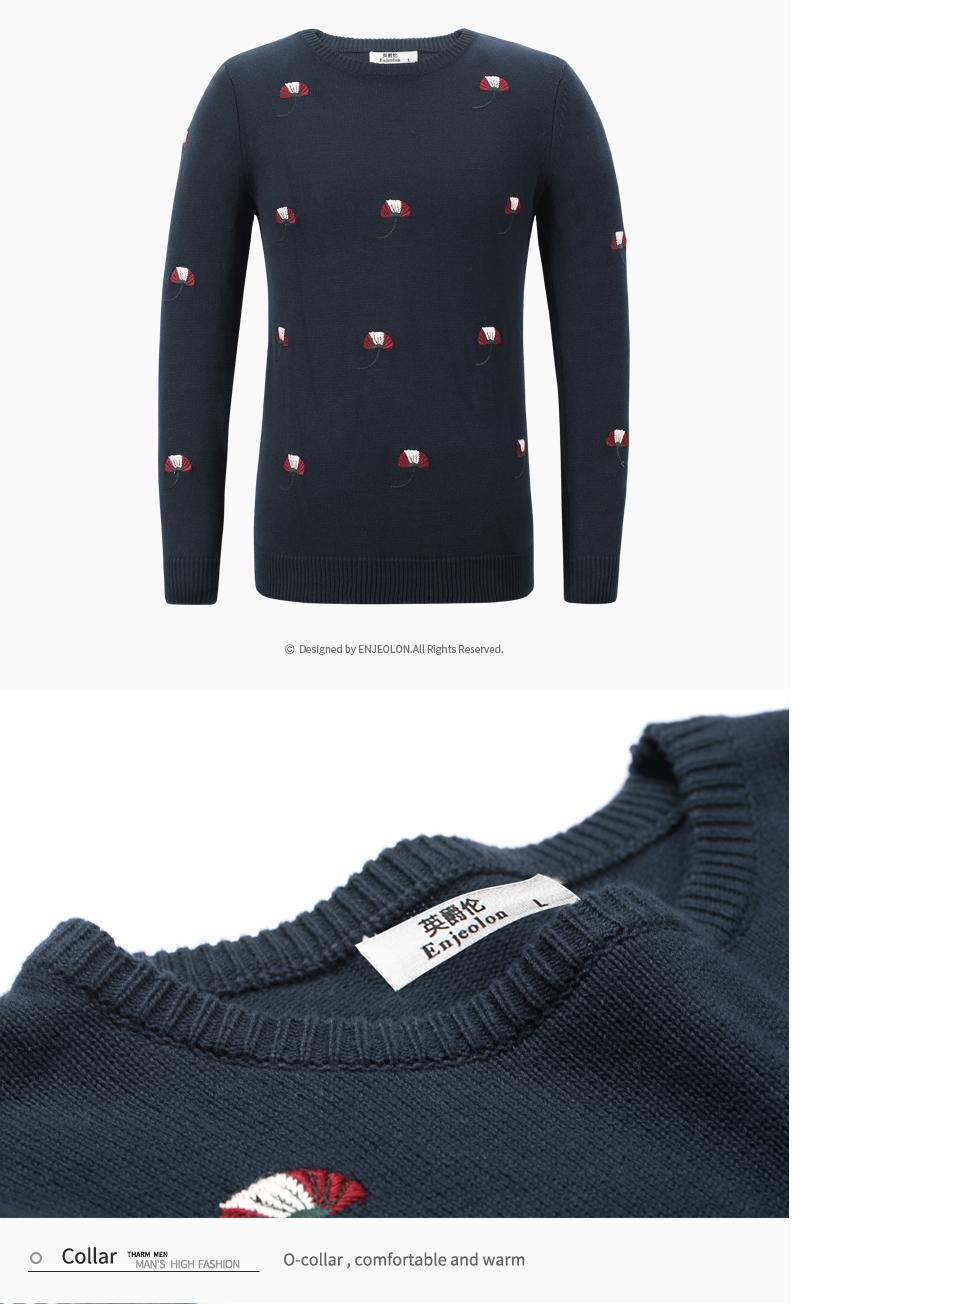 HTB1vmwBbRUSMeJjSszcq6znwVXaL - Enjeolon brand top fall winter warm knitted pullovers Sweater man 100 Cotton pattern pullober o-neck pullover Sweater men MY3227